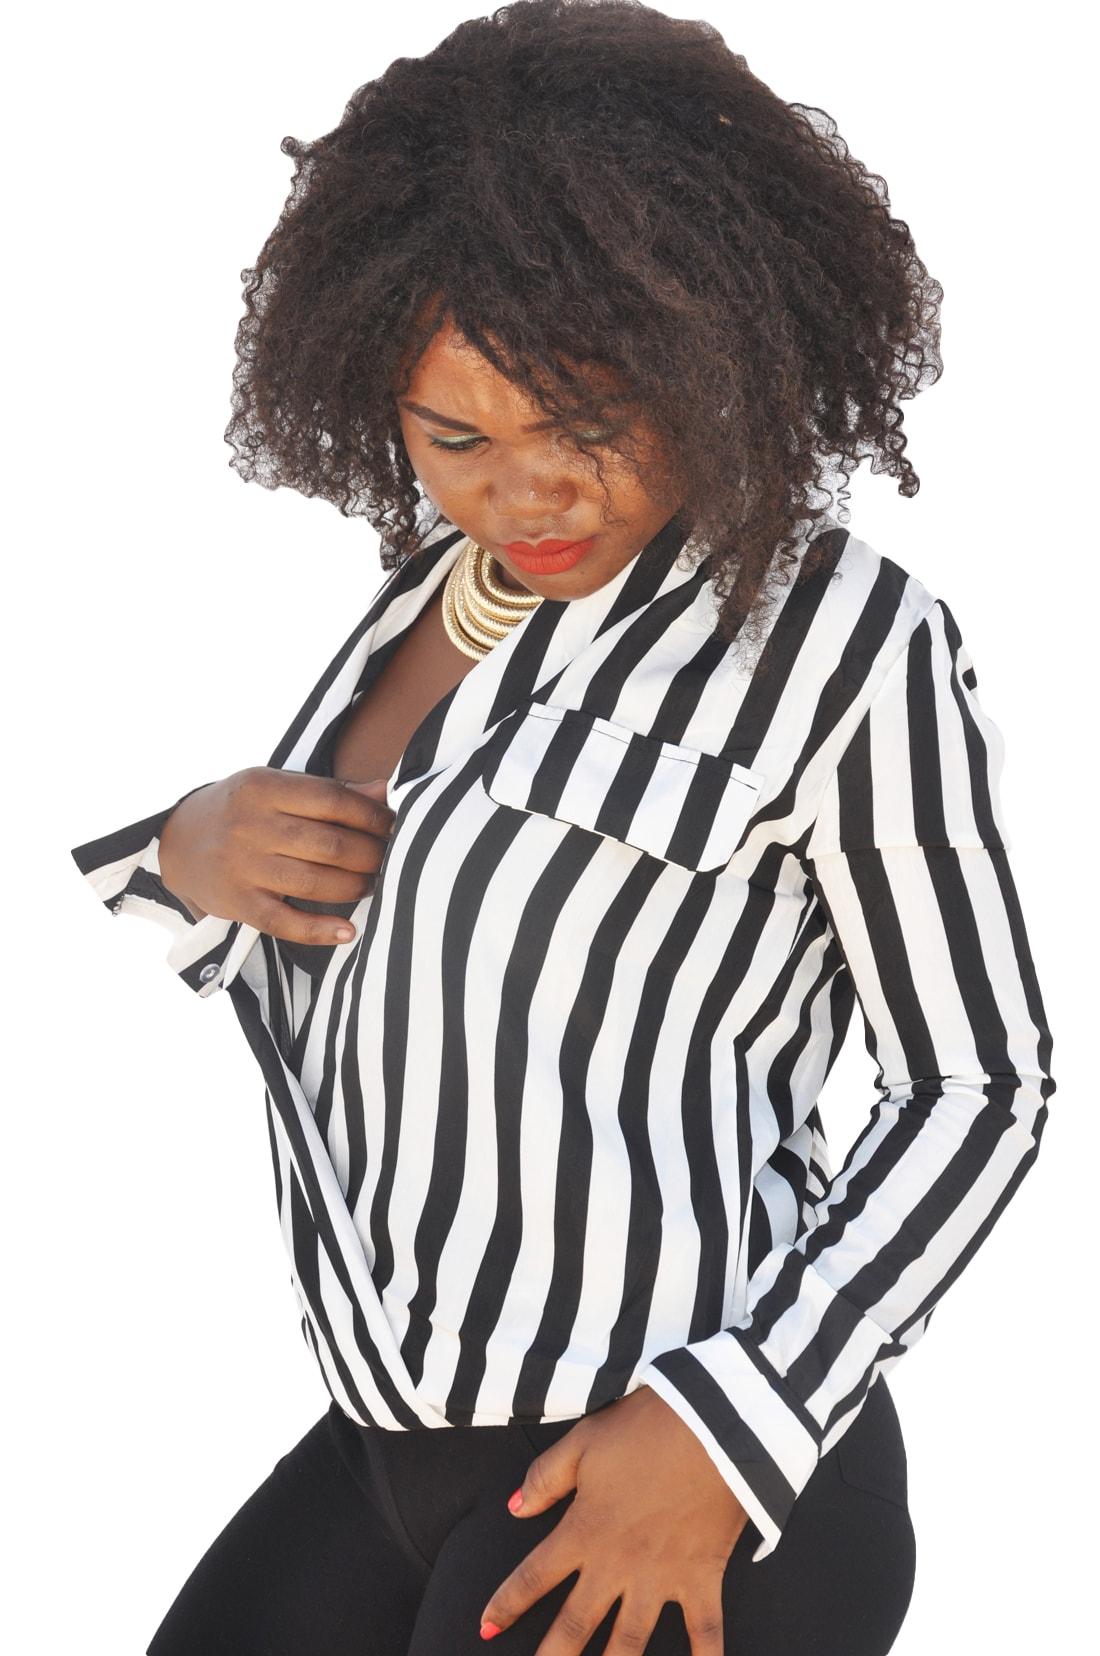 M0221 blackwhite4 Blouses Tops Shirts maureens.com boutique